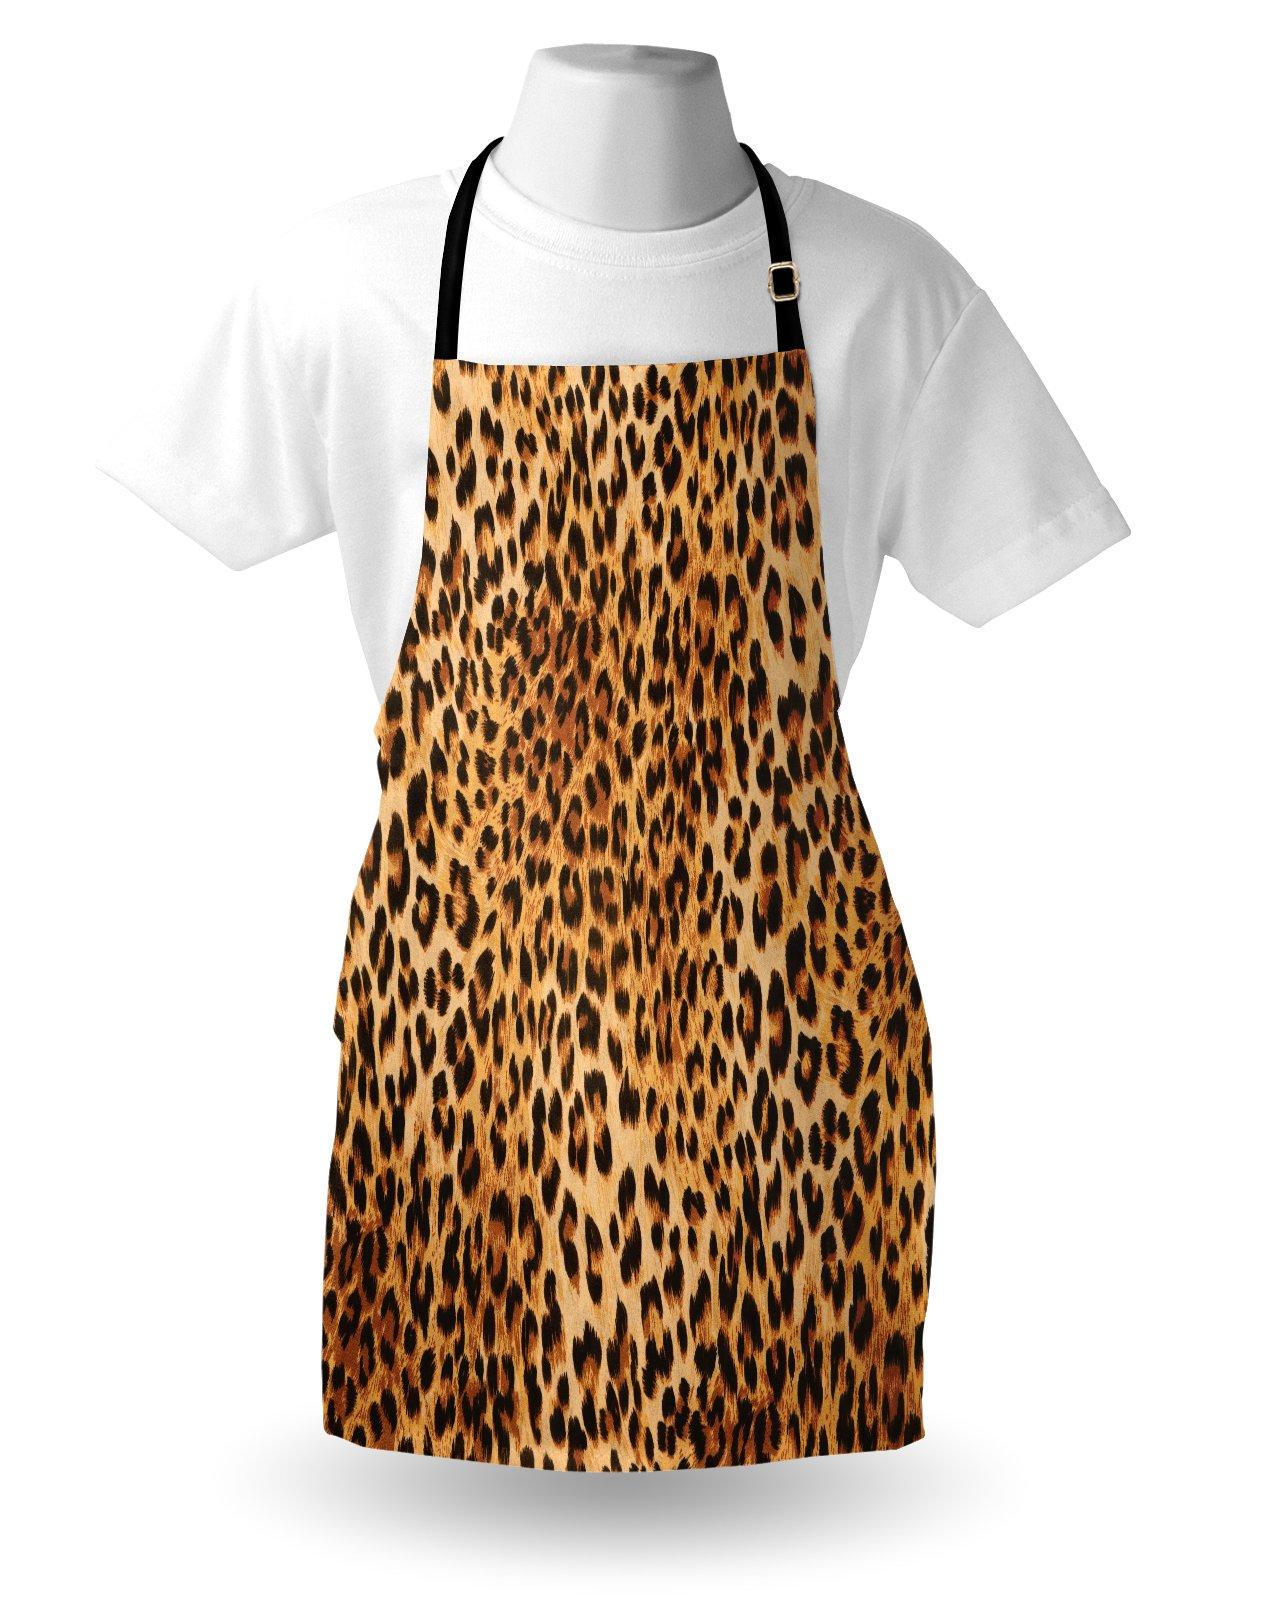 Lunarable Animal Print Apron, Wild Animal Leopard Skin Pattern Wildlife Nature Inspired Modern Illustration, Unisex Kitchen Bib Apron with Adjustable Neck for Cooking Baking Gardening, Sand Brown by Lunarable (Image #3)